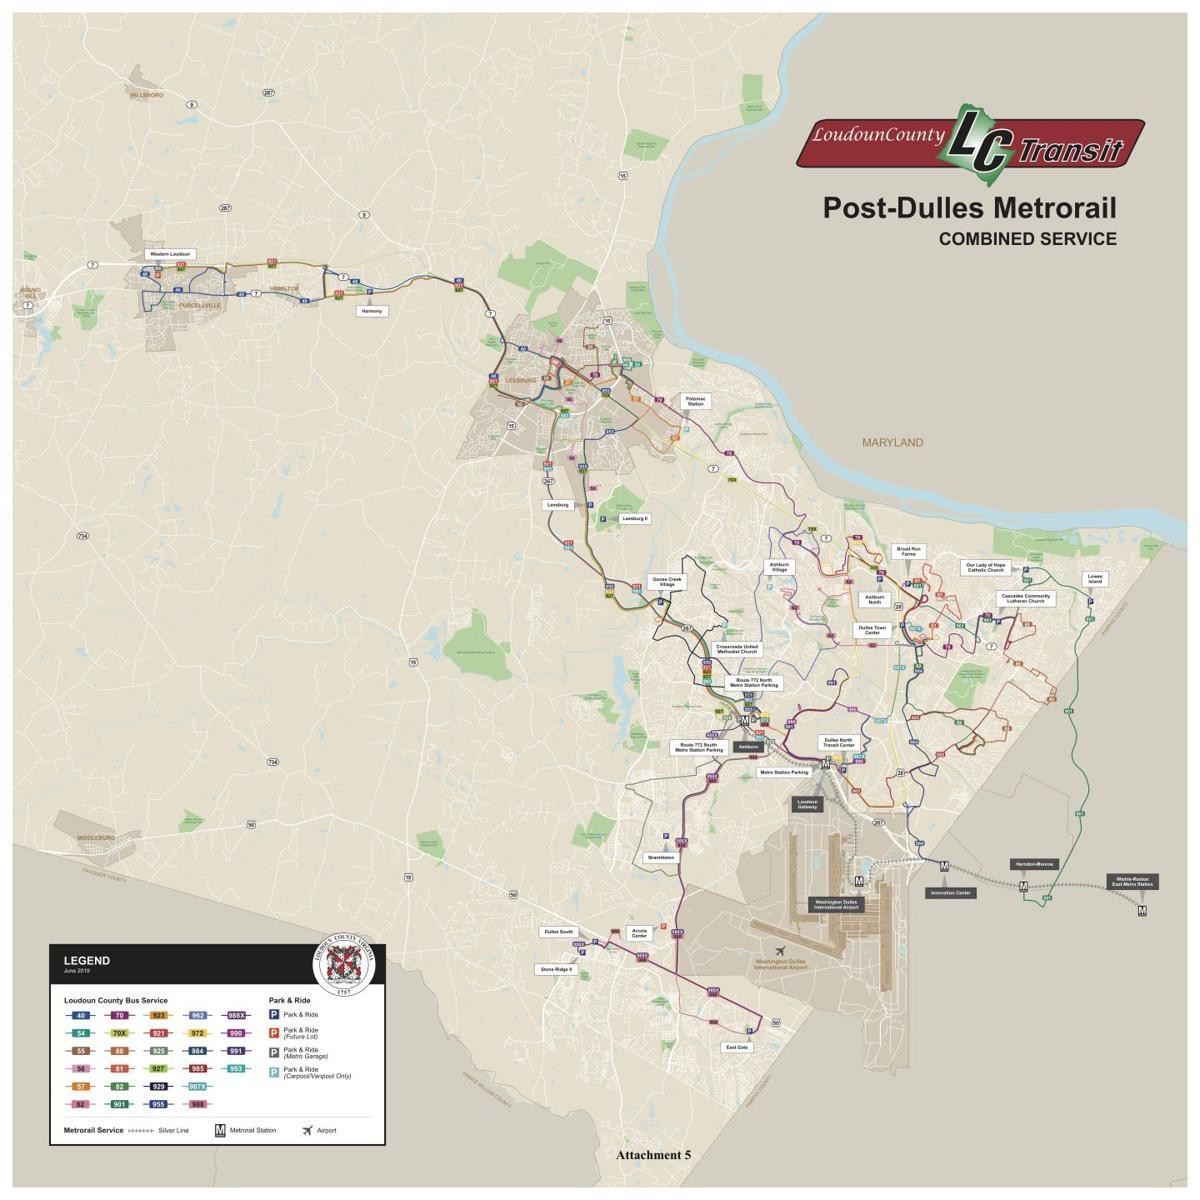 Loudoun County | Post-Dulles Metrorail Combined Service model